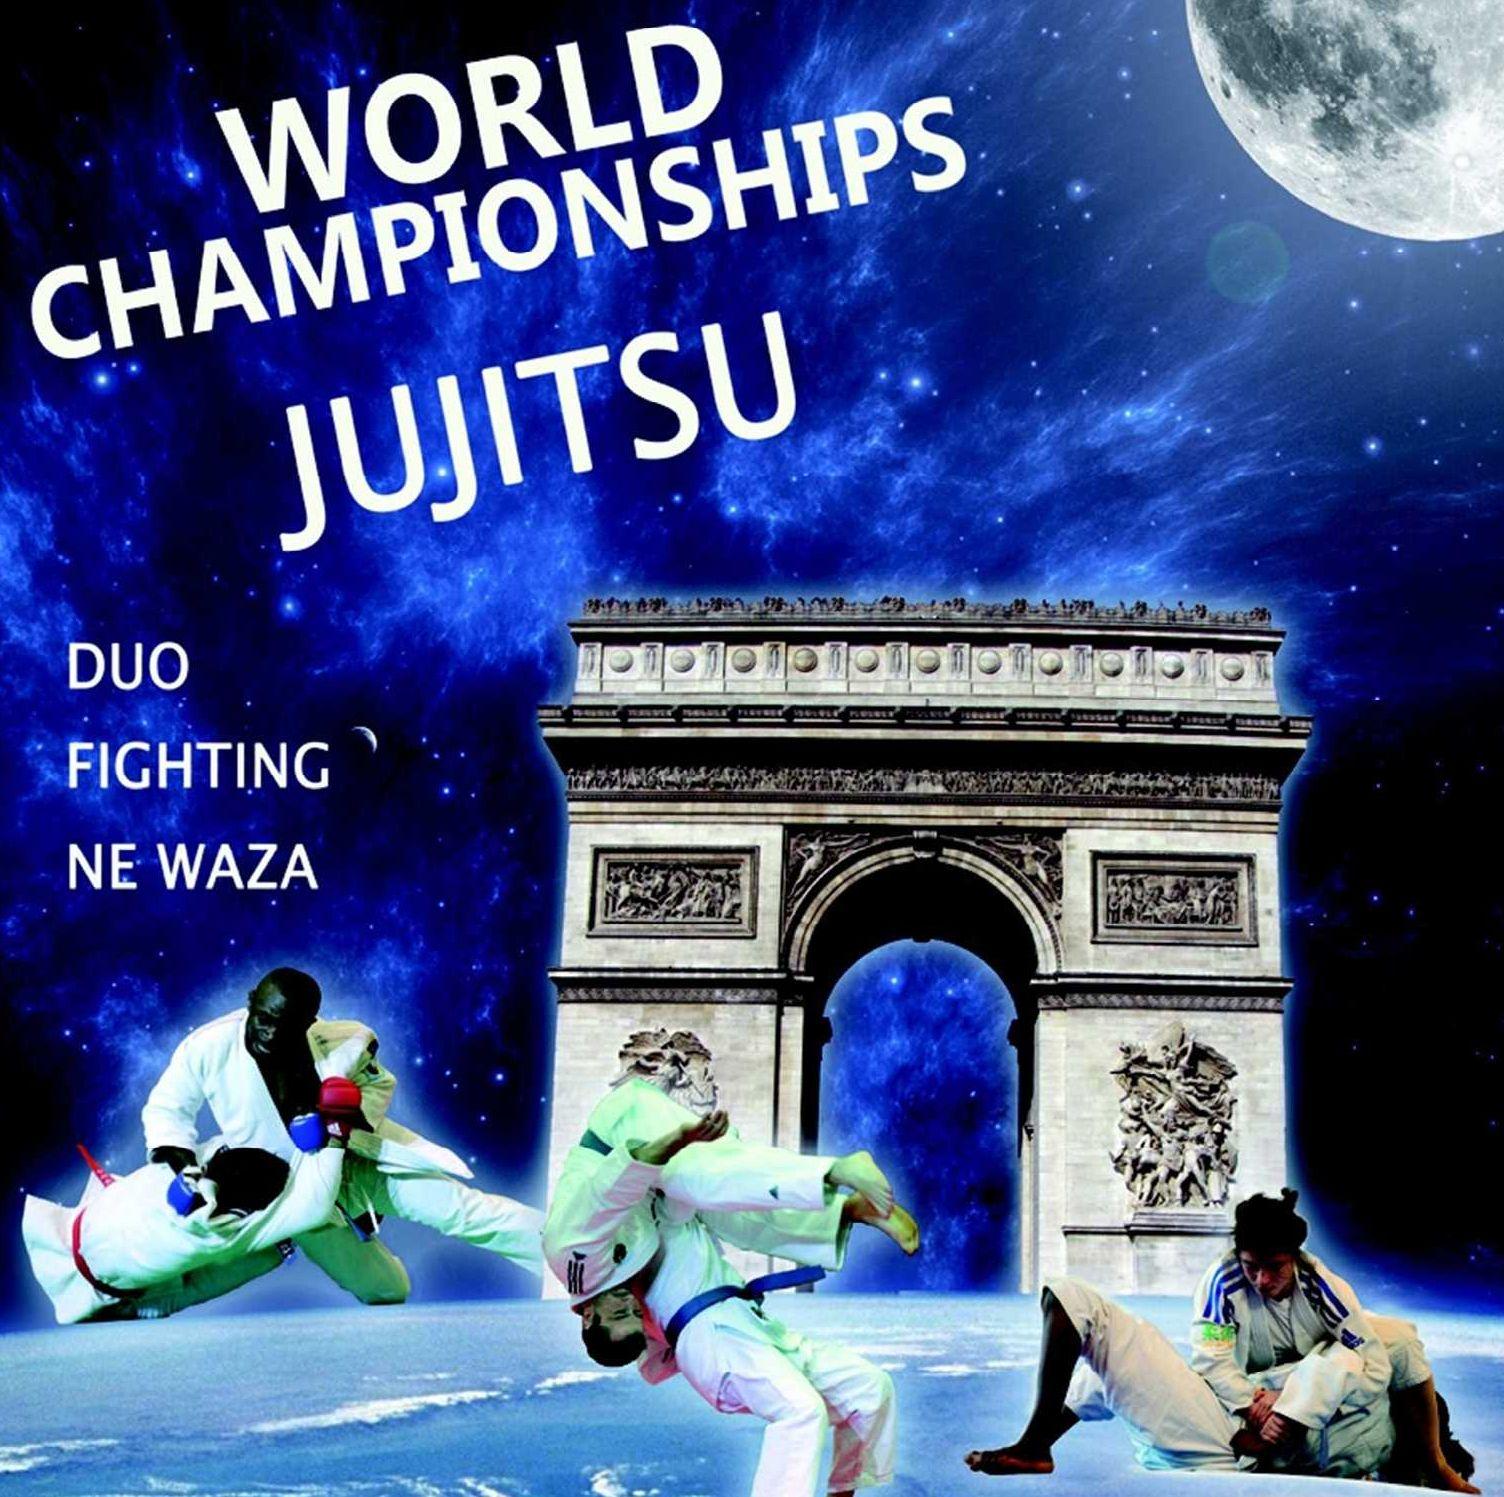 World Championship 2014 Paris